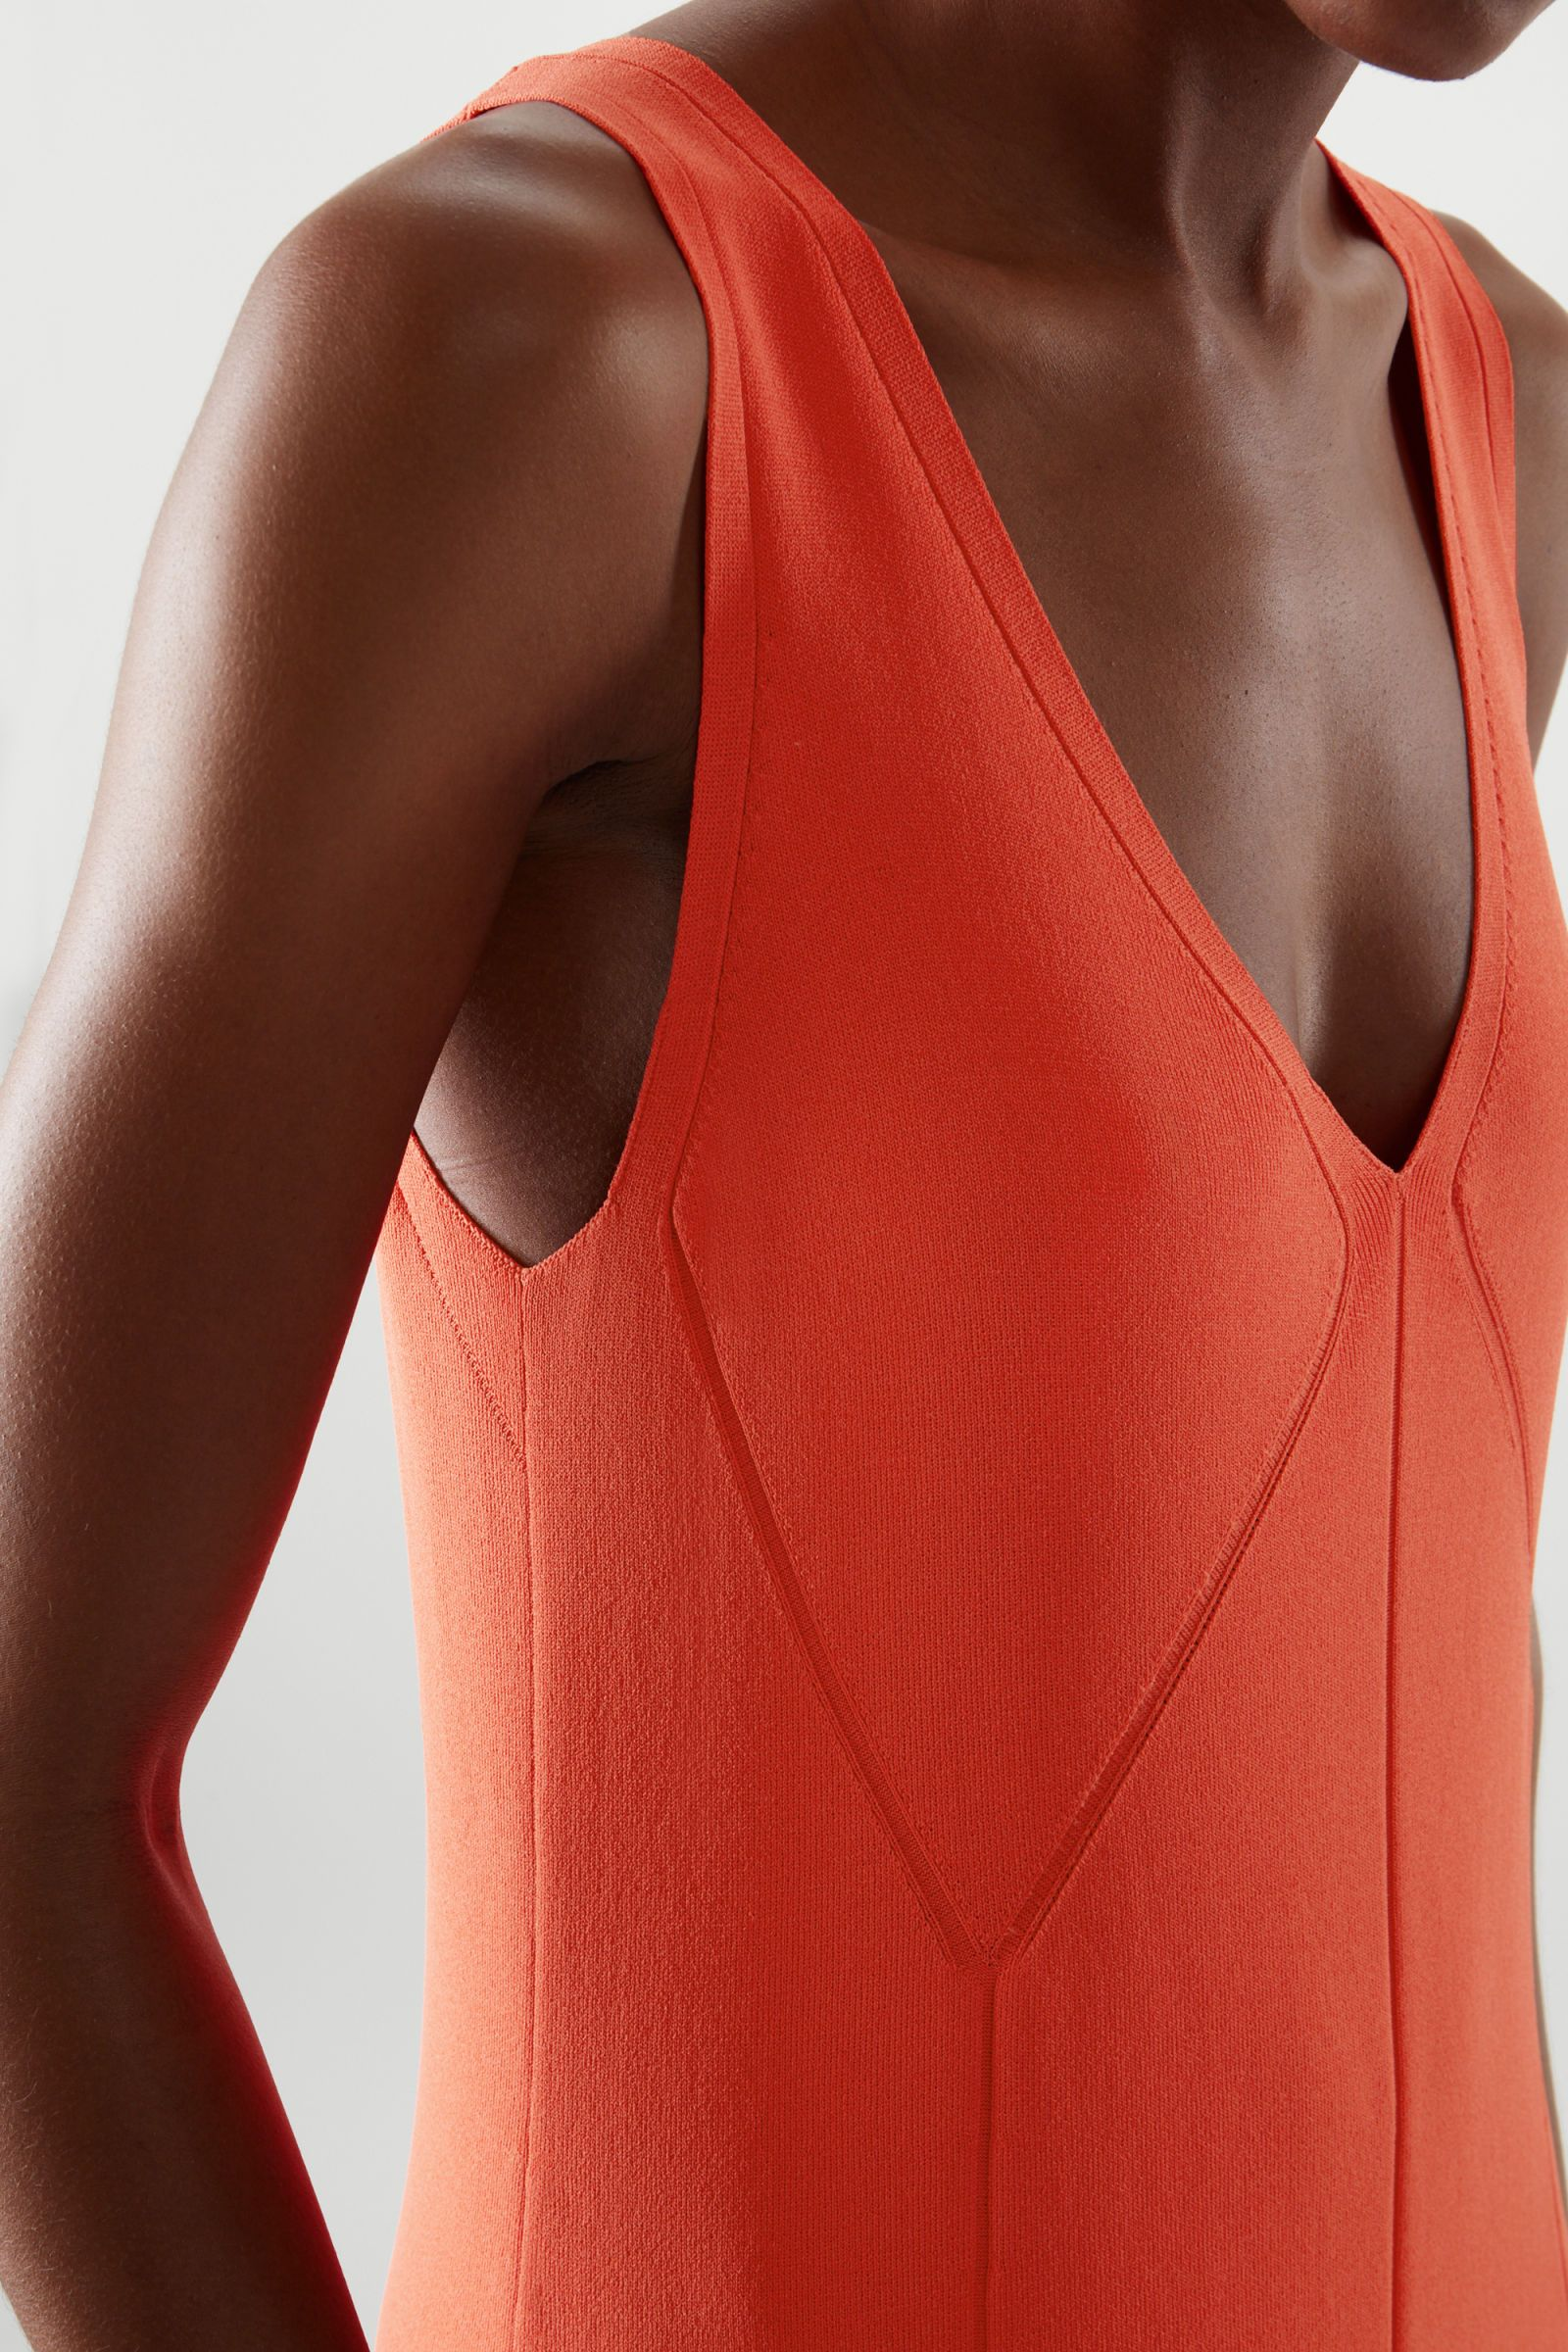 LOW-CUT MAXI DRESS LOW-CUT MAXI DRESS - orange - D